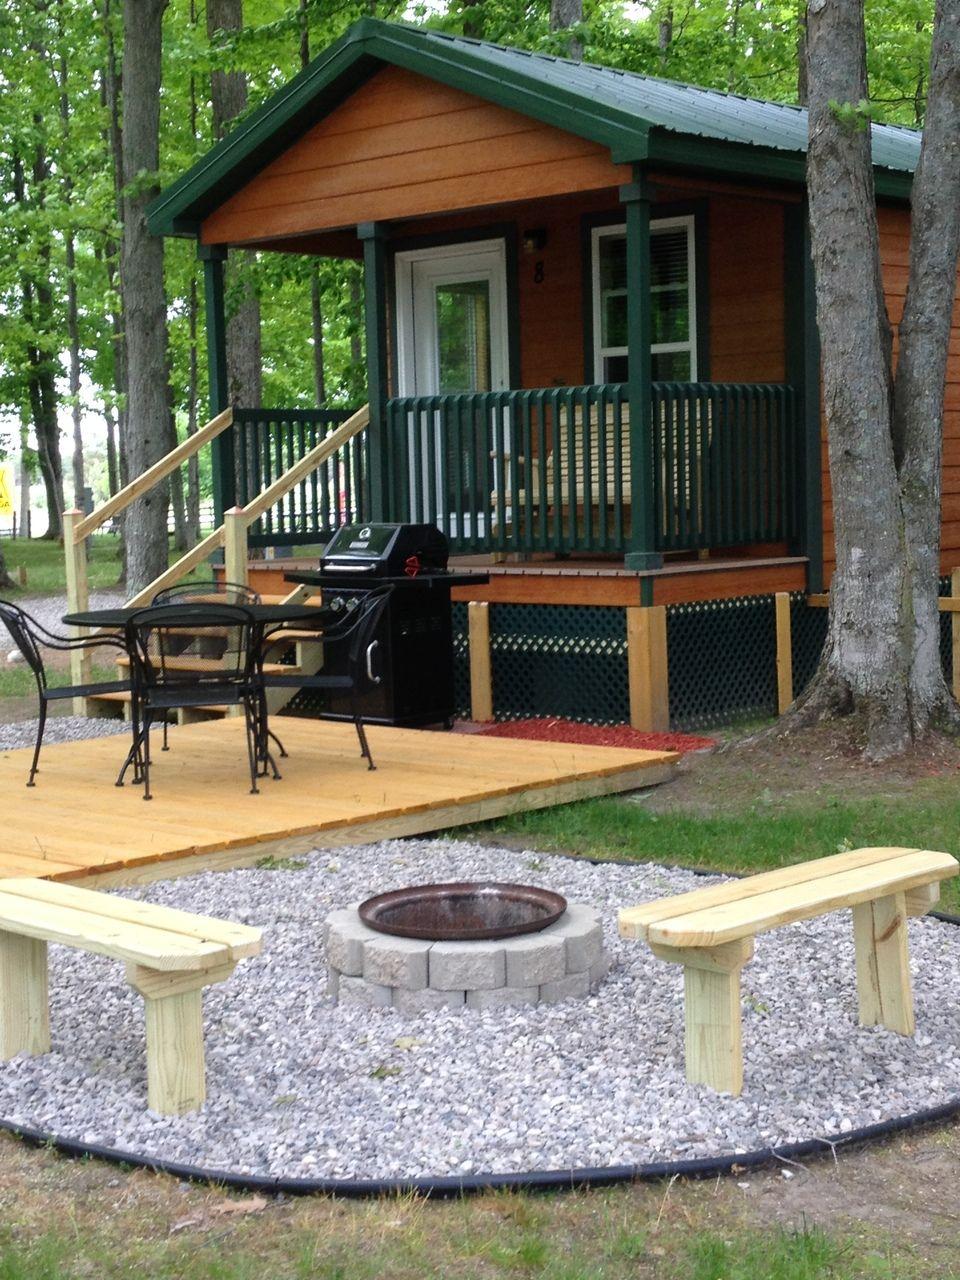 cabins traversecity midwest o traverse riverside in heaven city cabin unitedstatesofamerica michigan slice